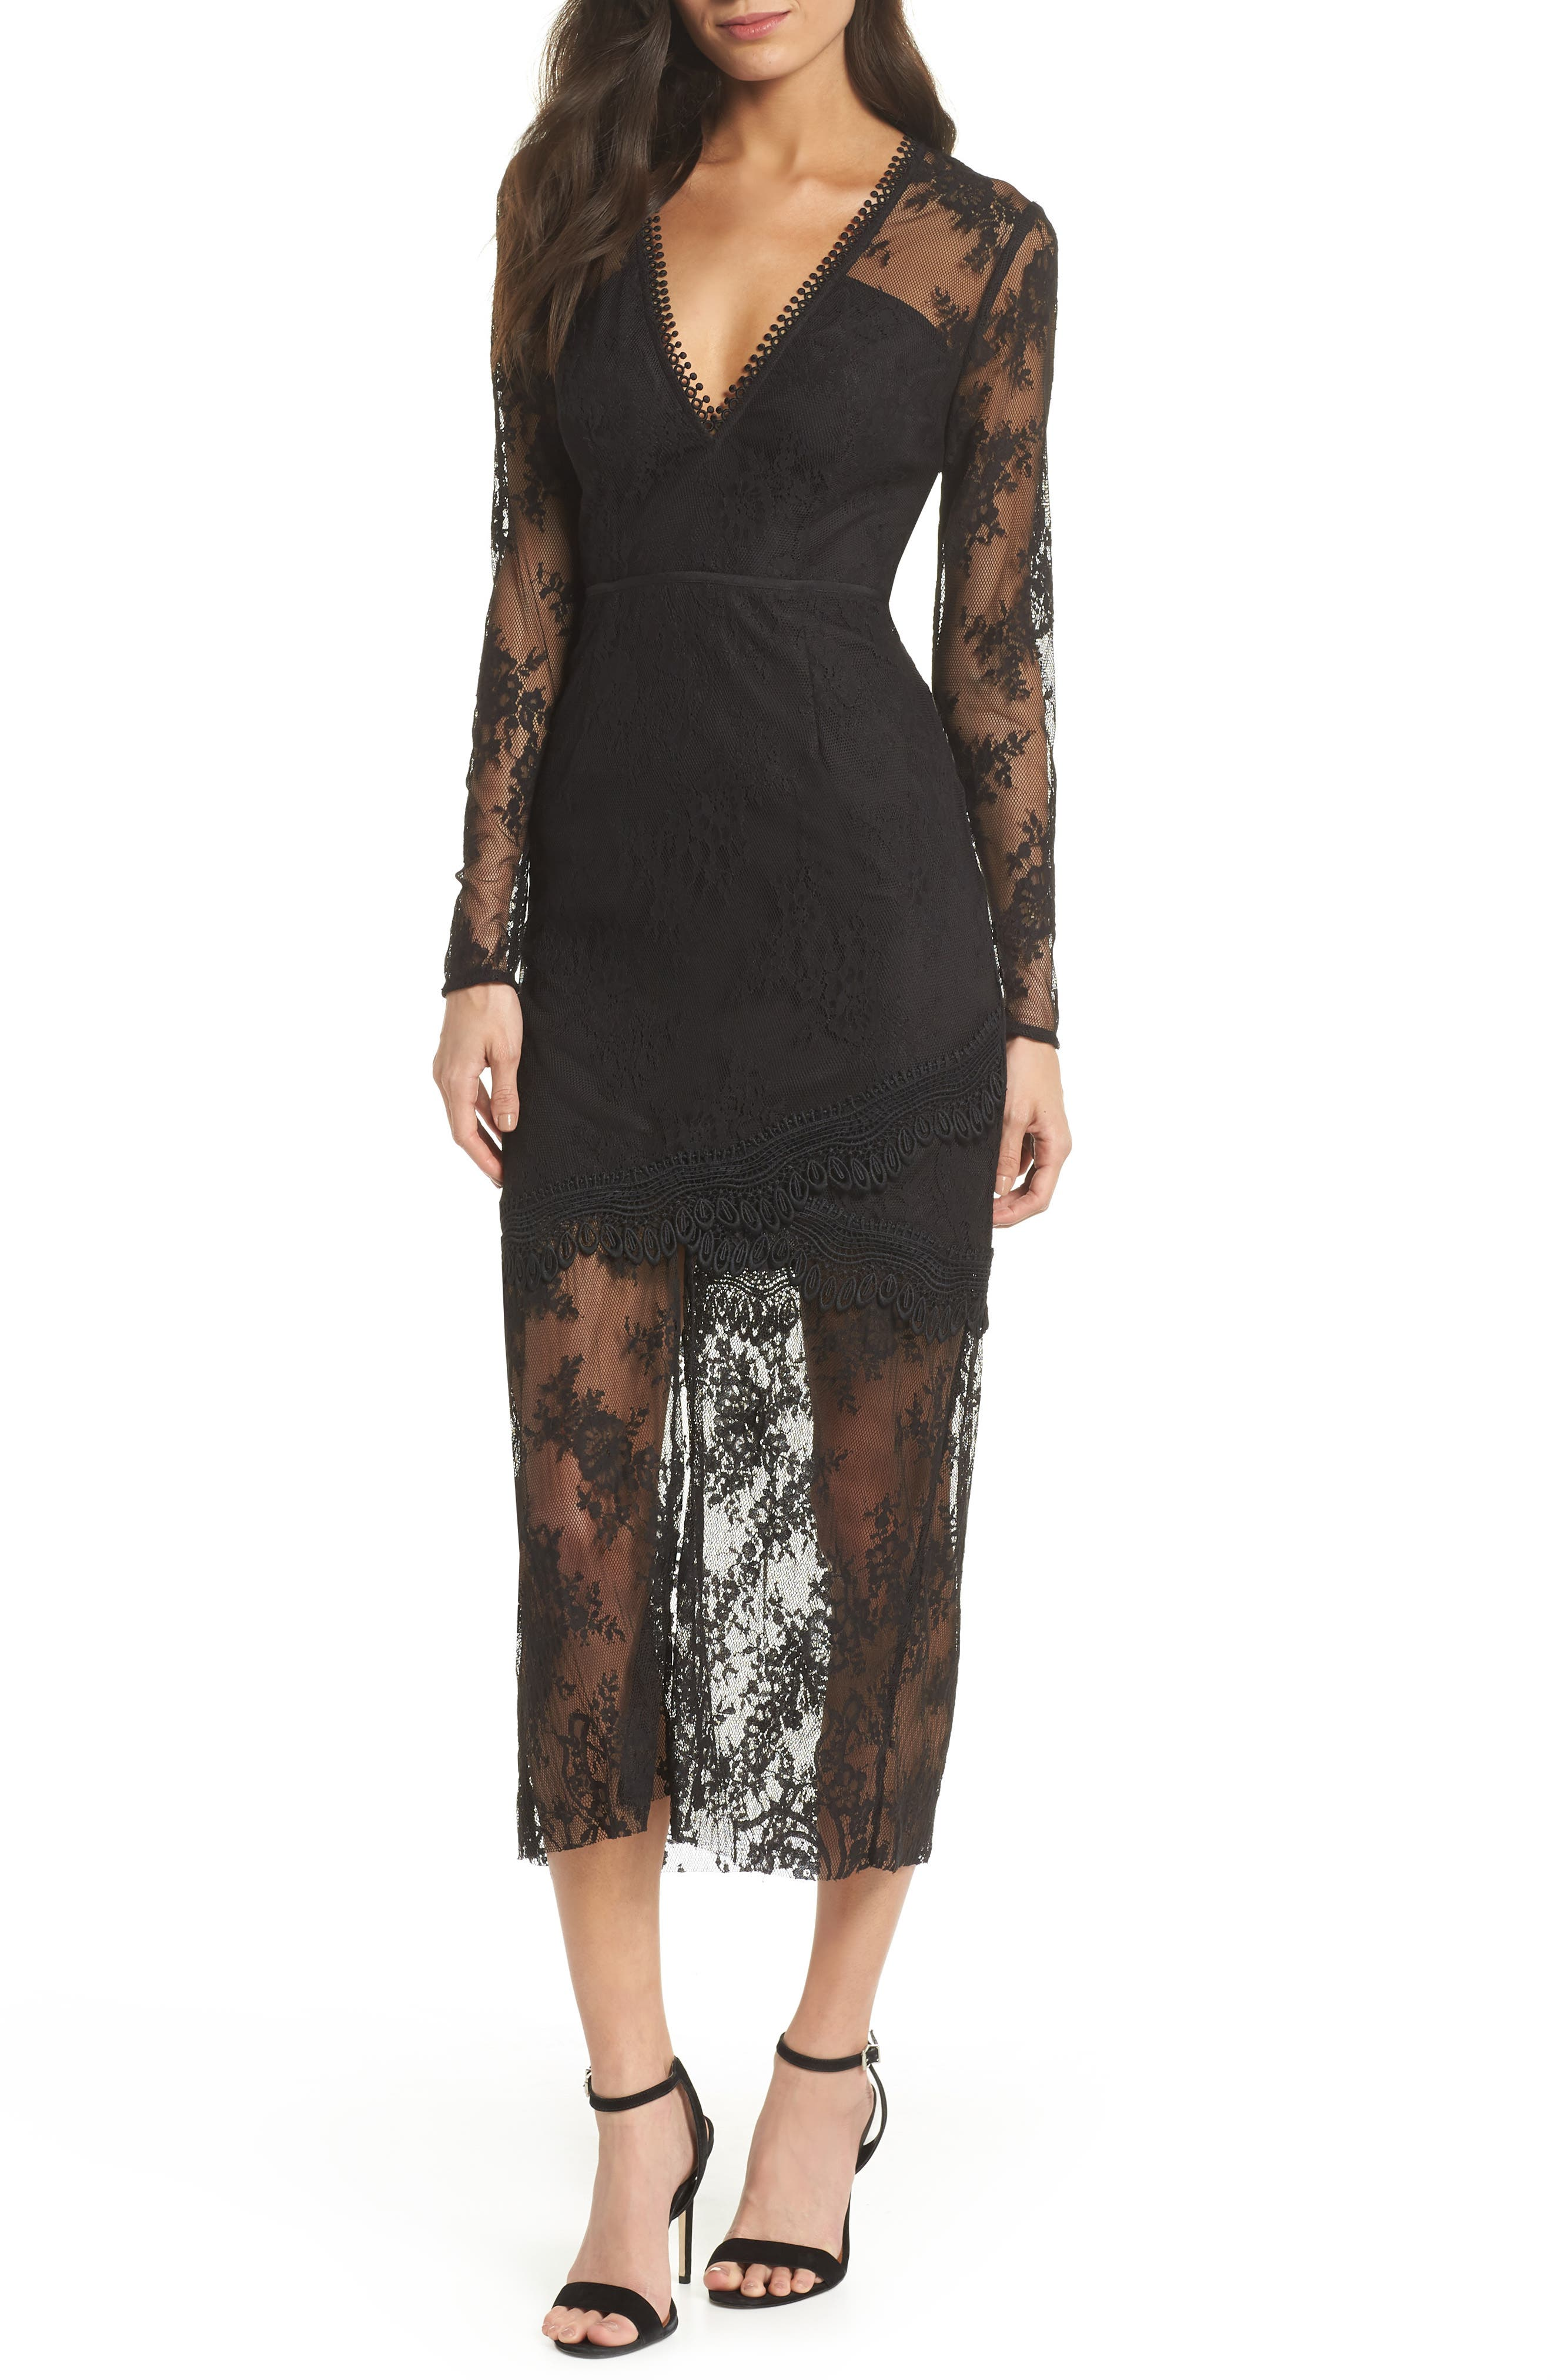 True Chemistry Lace Sheath Dress,                             Main thumbnail 1, color,                             Black